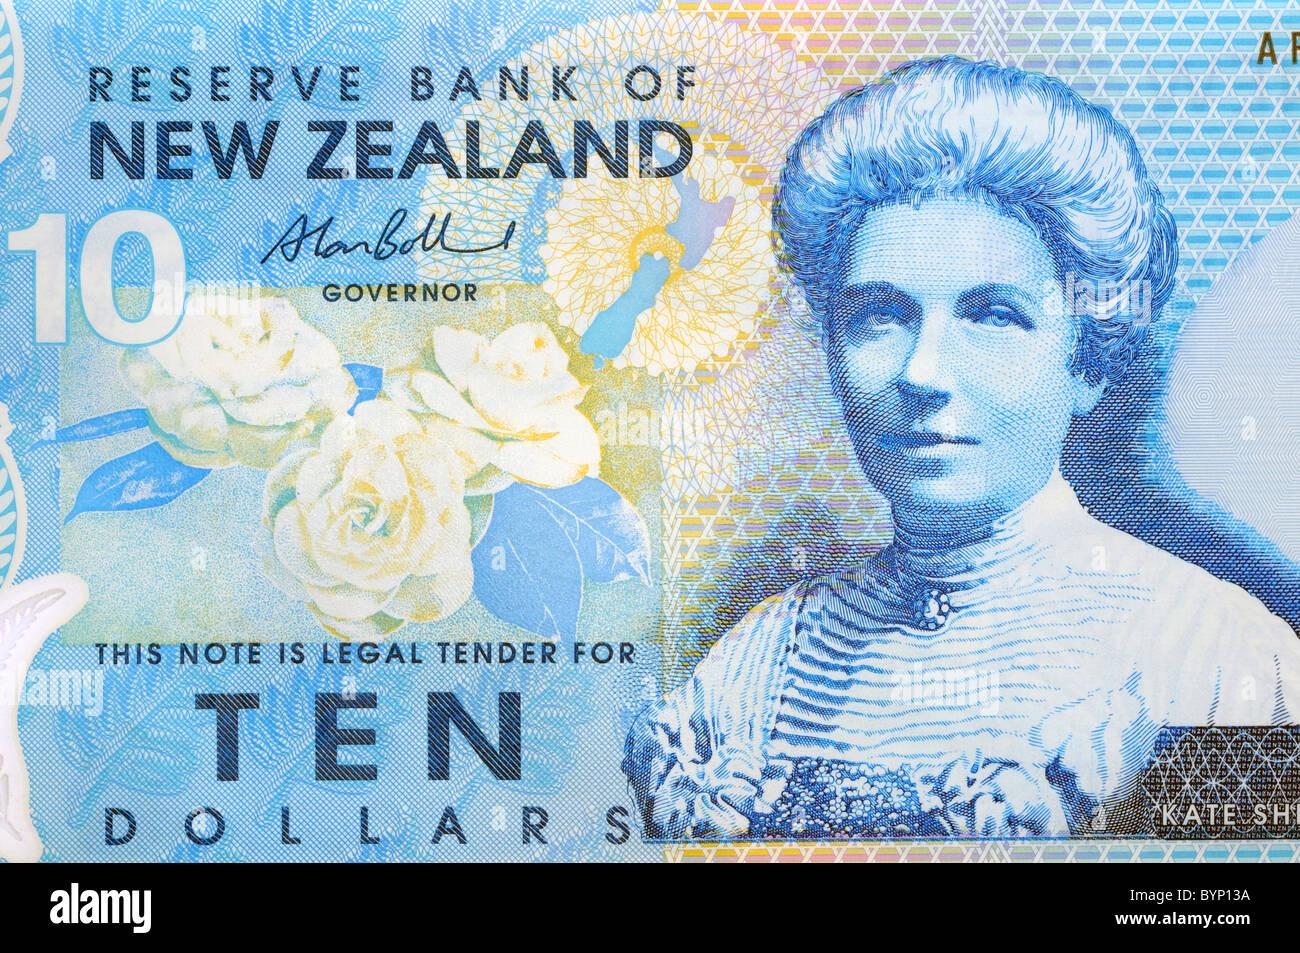 New Zealand Ten 10 Dollar Note. - Stock Image